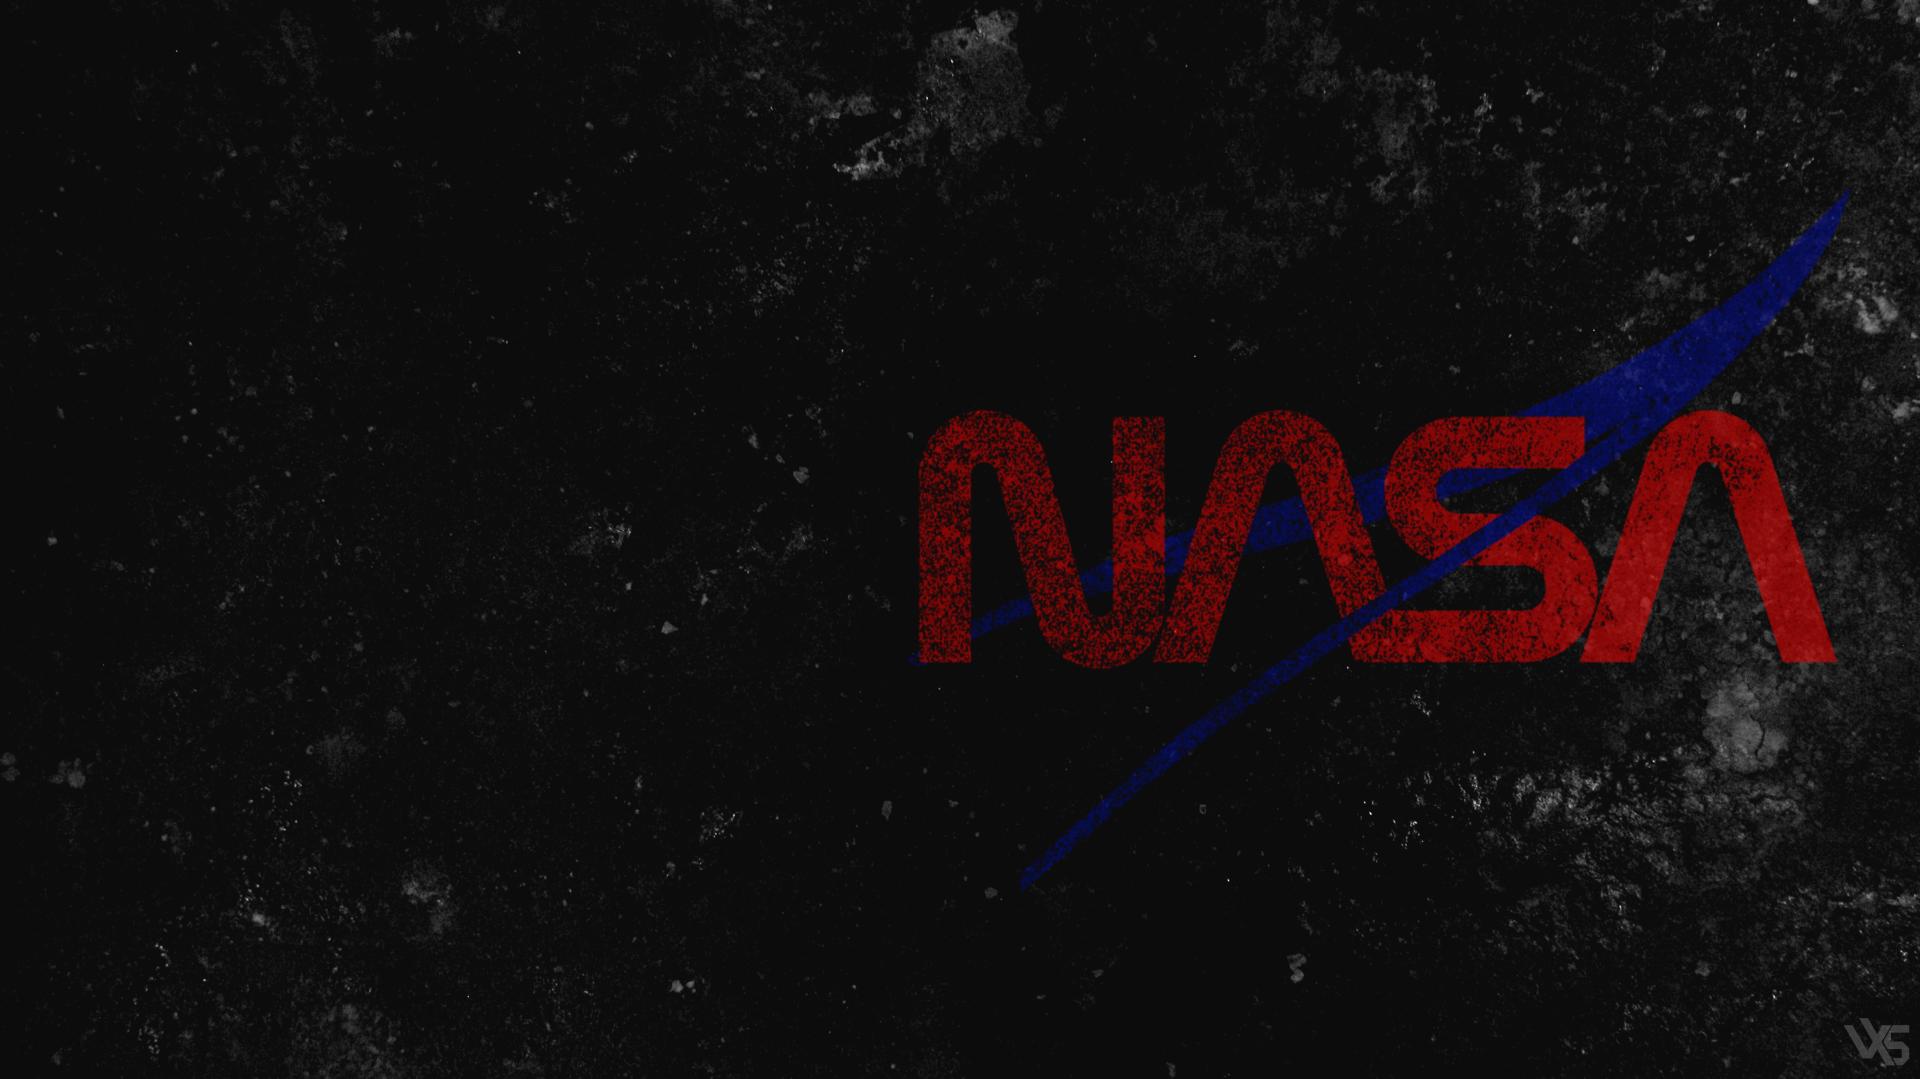 NASA worm logo 4k Ultra HD Wallpaper and Background ...